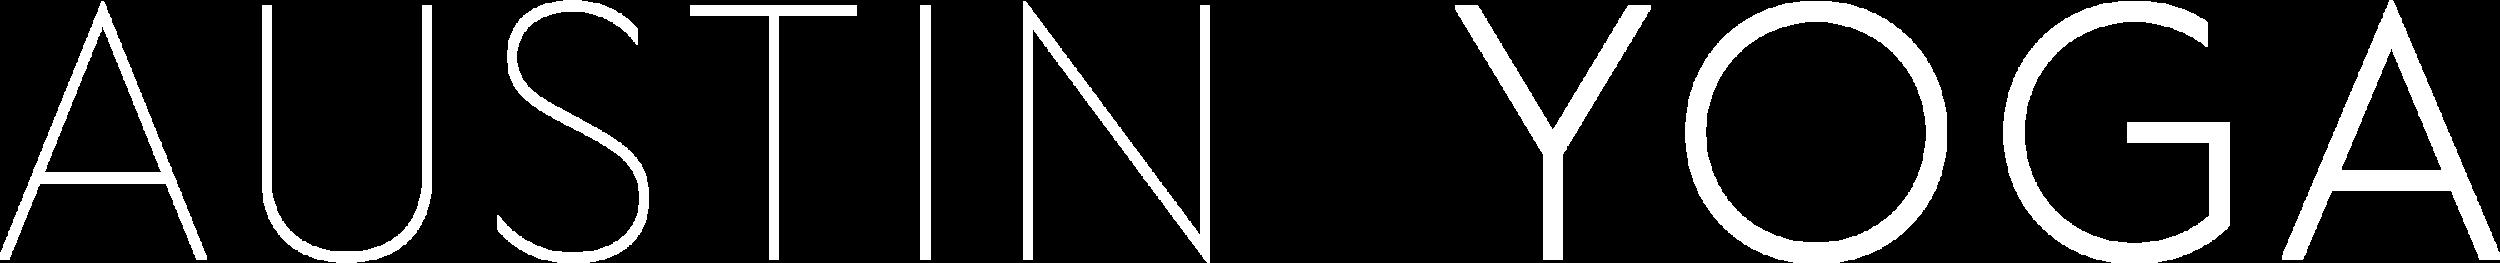 horizontal-lockup-white.png